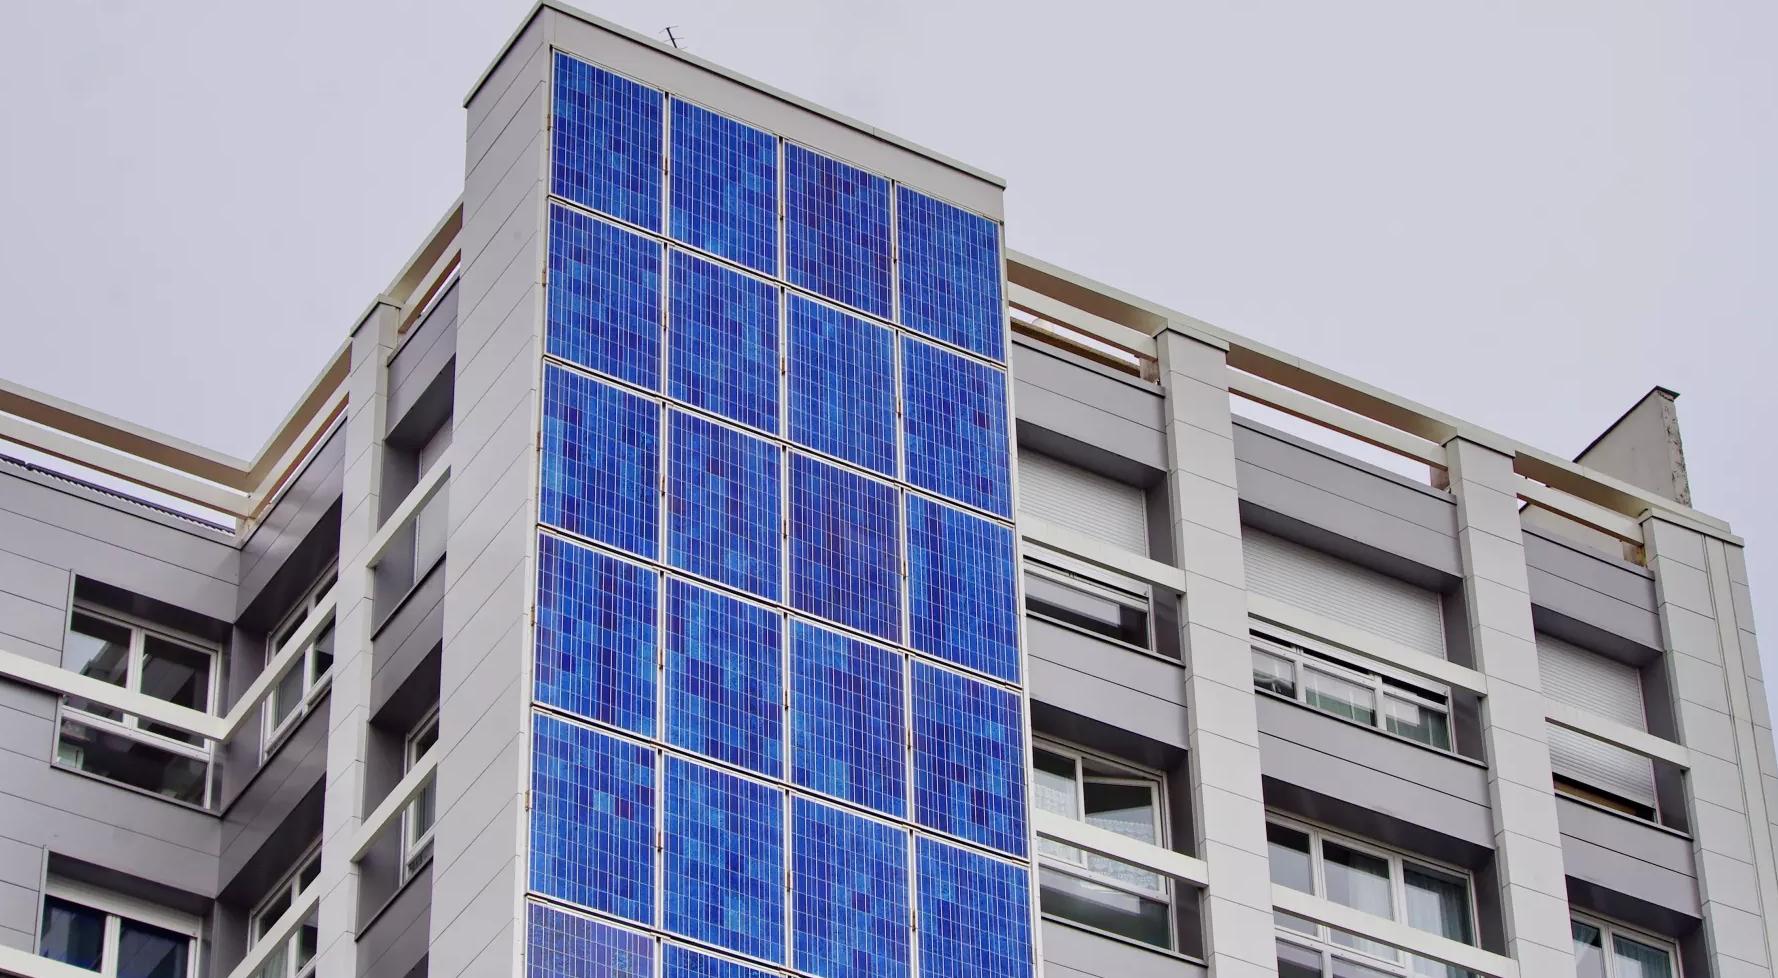 A photovoltaic facade on a building in Rue des Pyrénées, Paris. Picture: Pascal Poggi